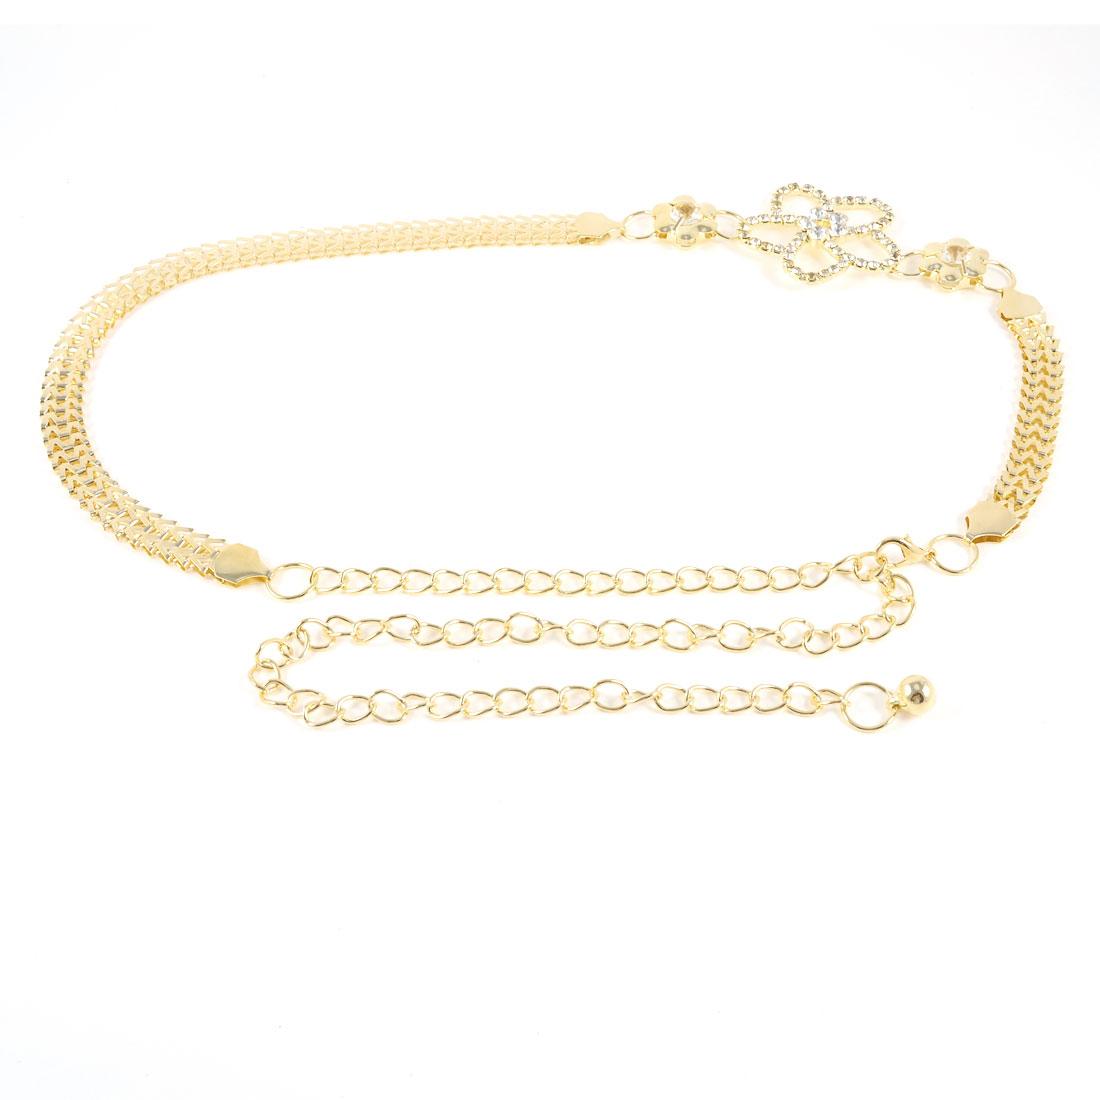 Women Glitter Rhinestone Detailed Flower Metal Waist Chain Belt Gold Tone